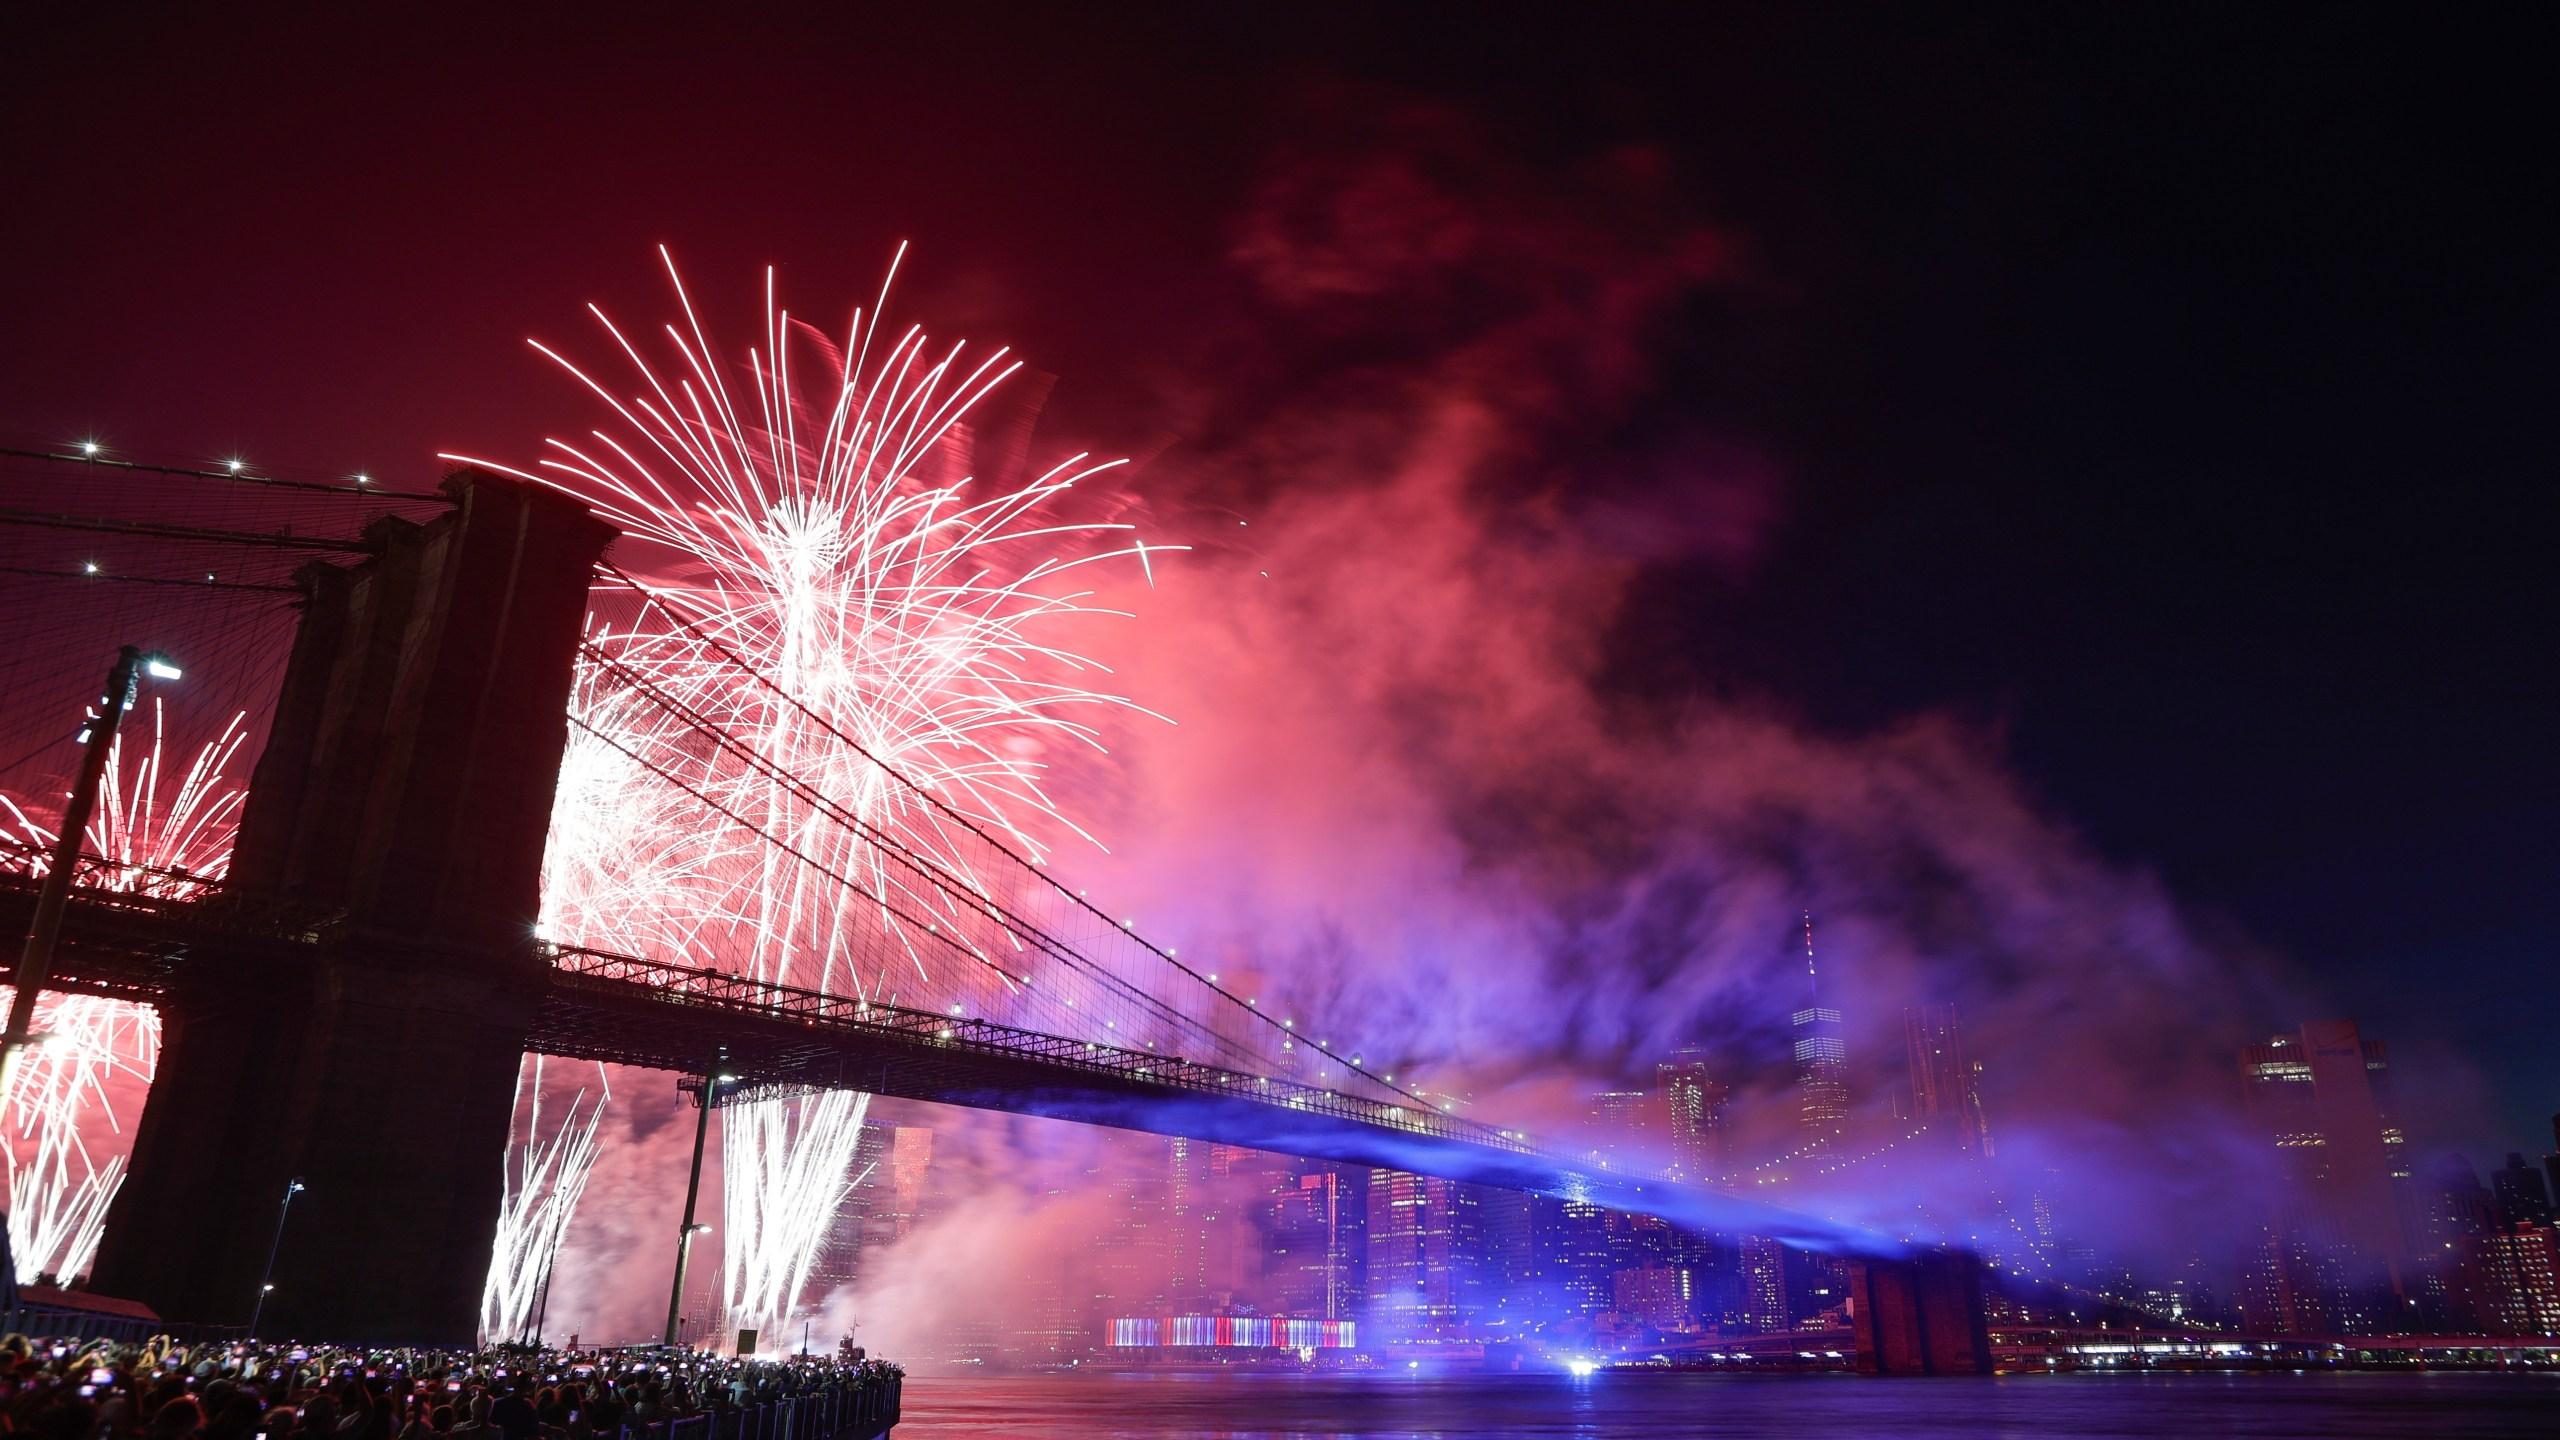 Retail union upset Macy's fireworks to go on despite furloughs